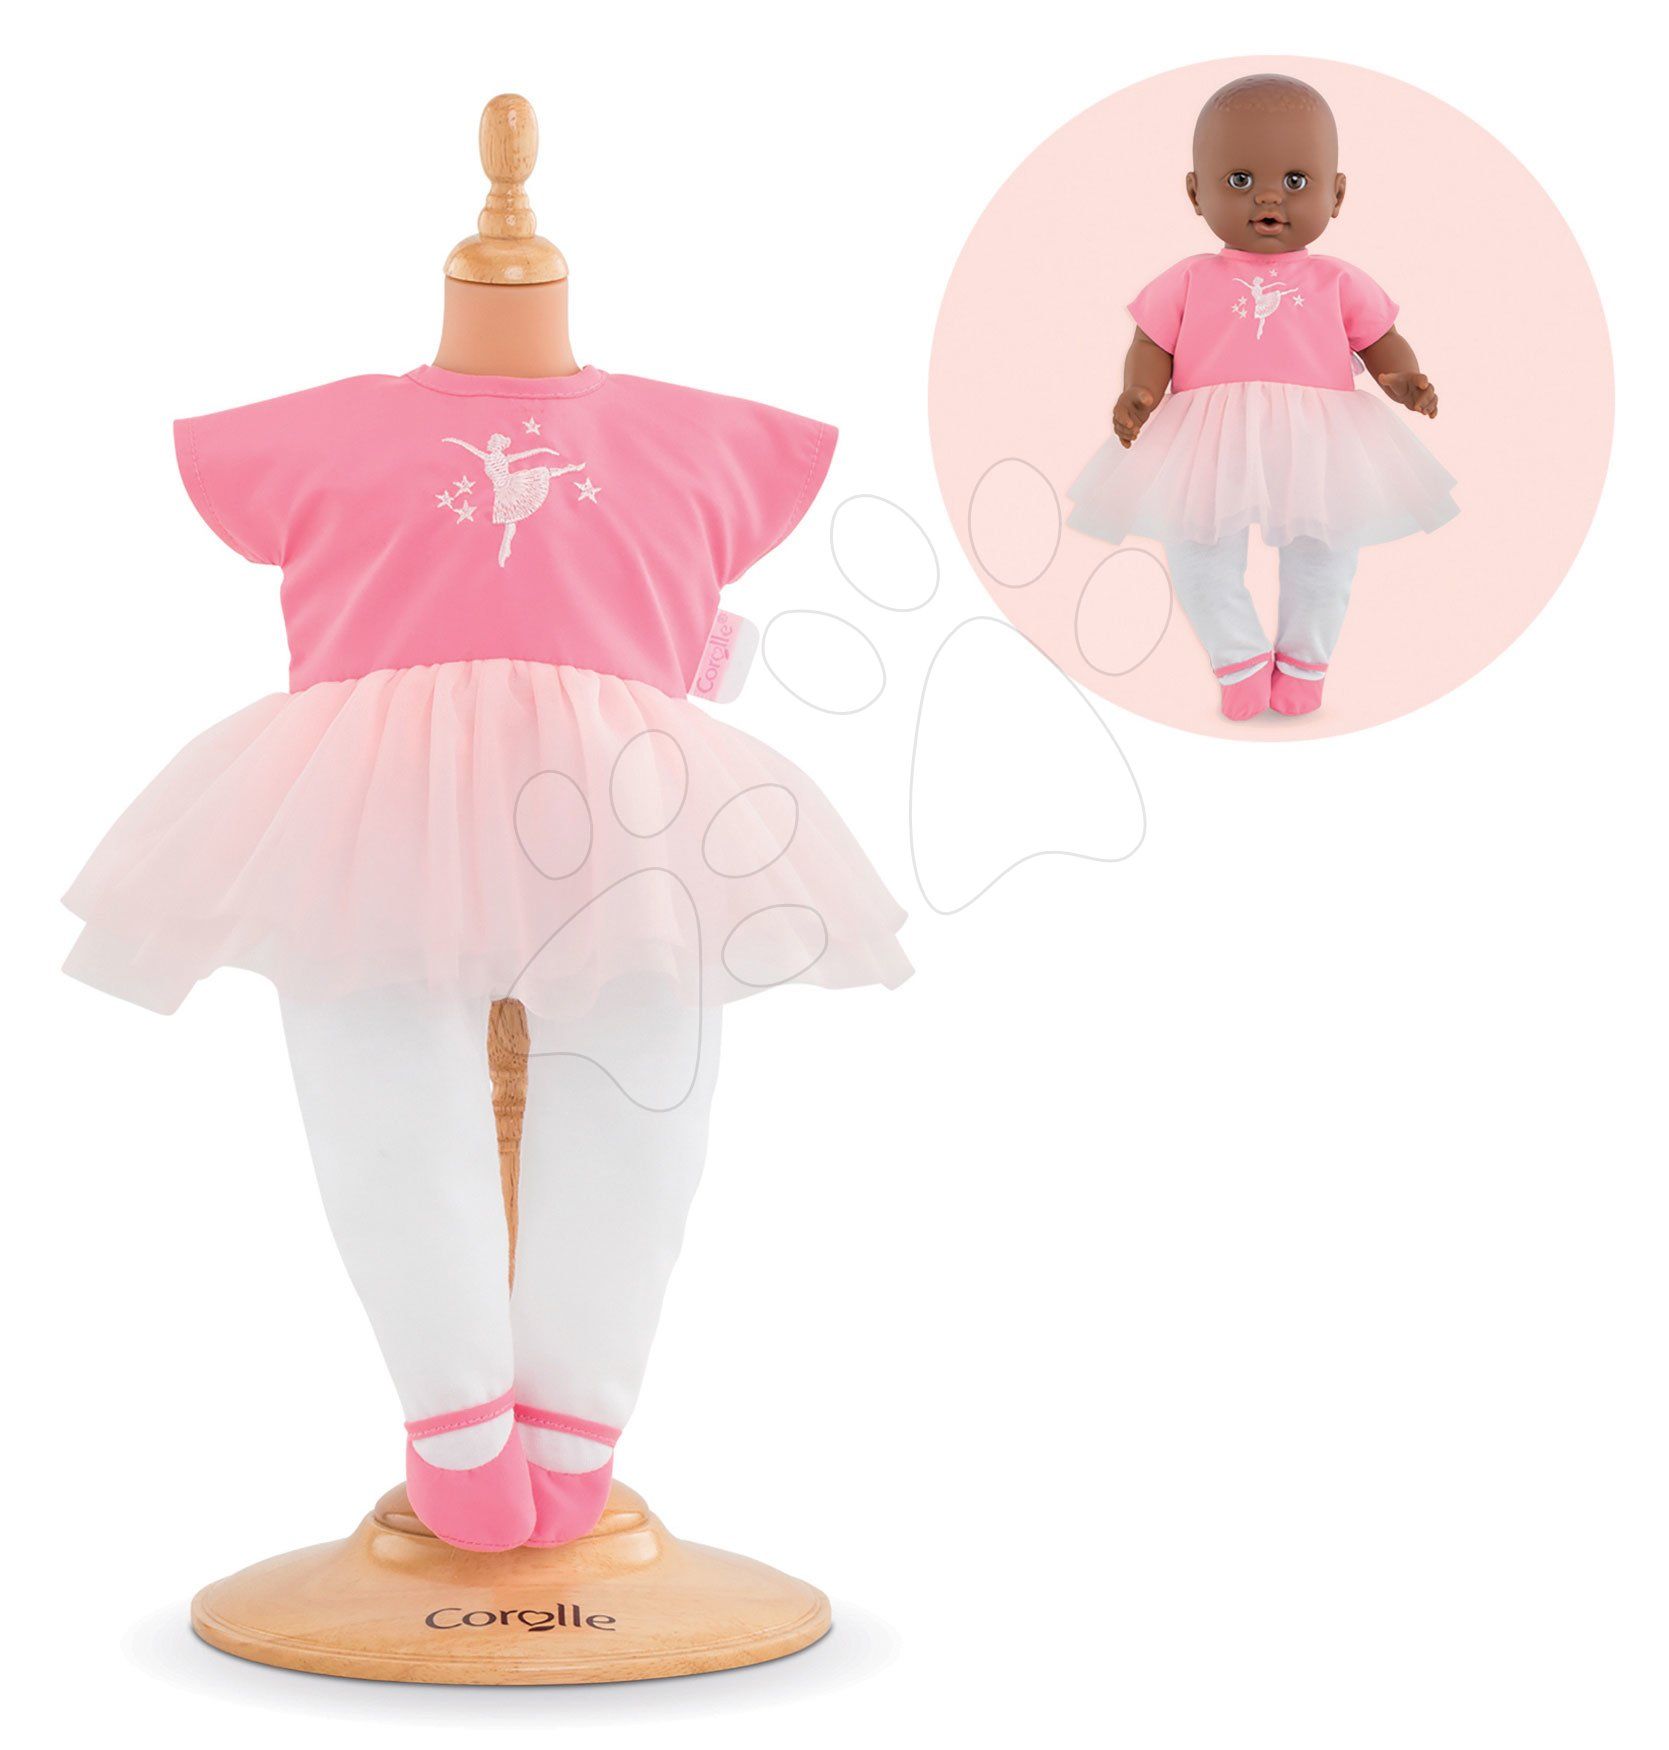 Oblečenie Ballerina Suit Opera Mon Grand Poupon Corolle pre 36 cm bábiku od 24 mes